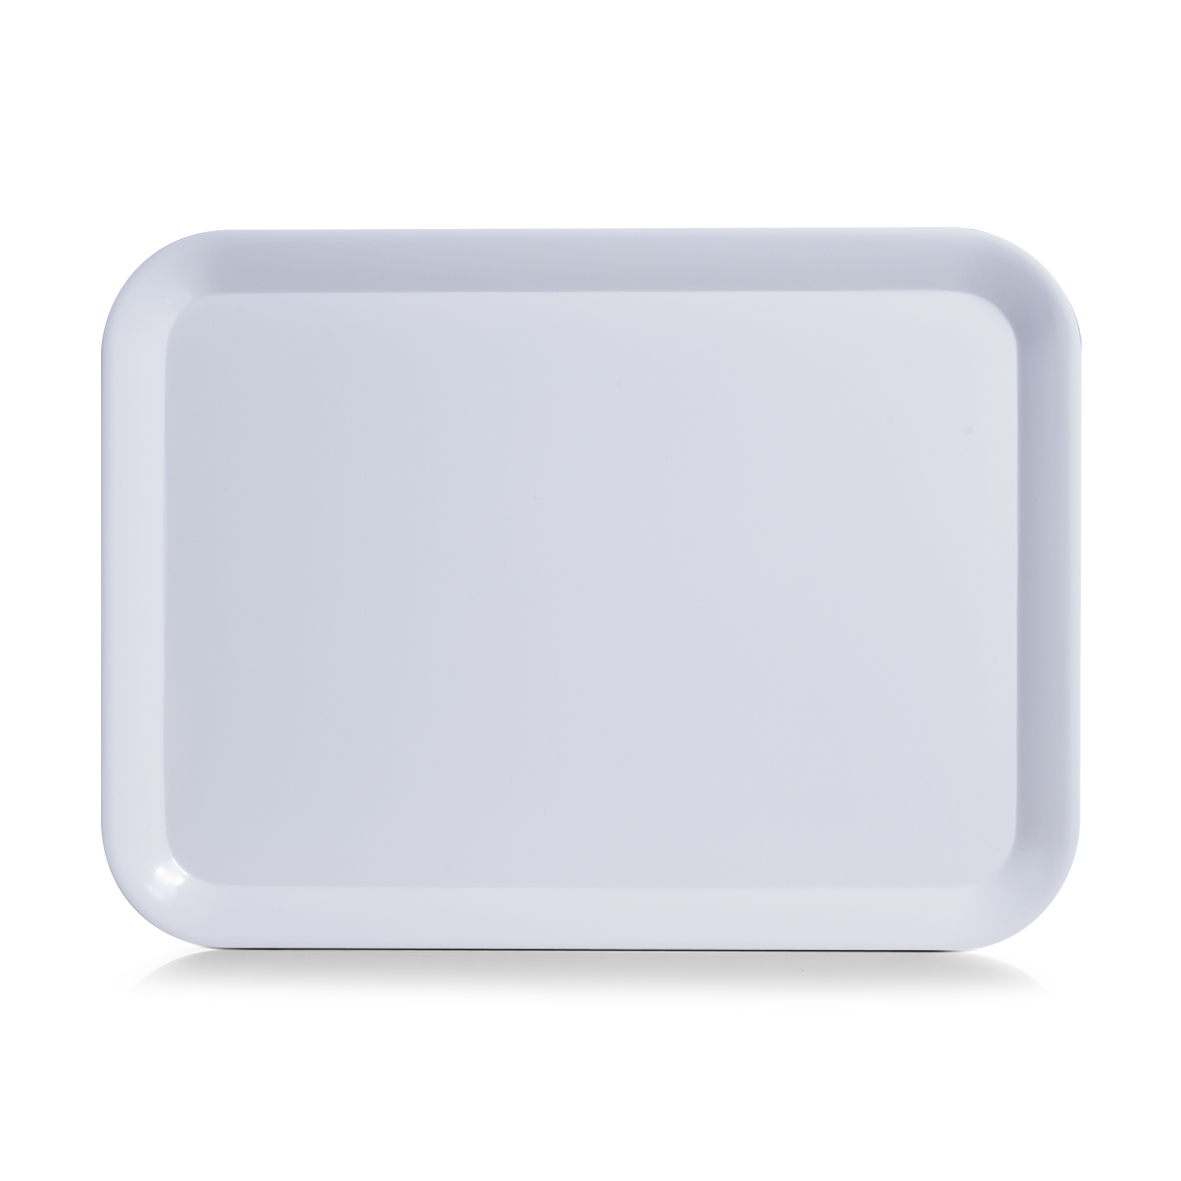 Tava pentru servire Aqua, Melamina, l43,5xA32,5 cm imagine